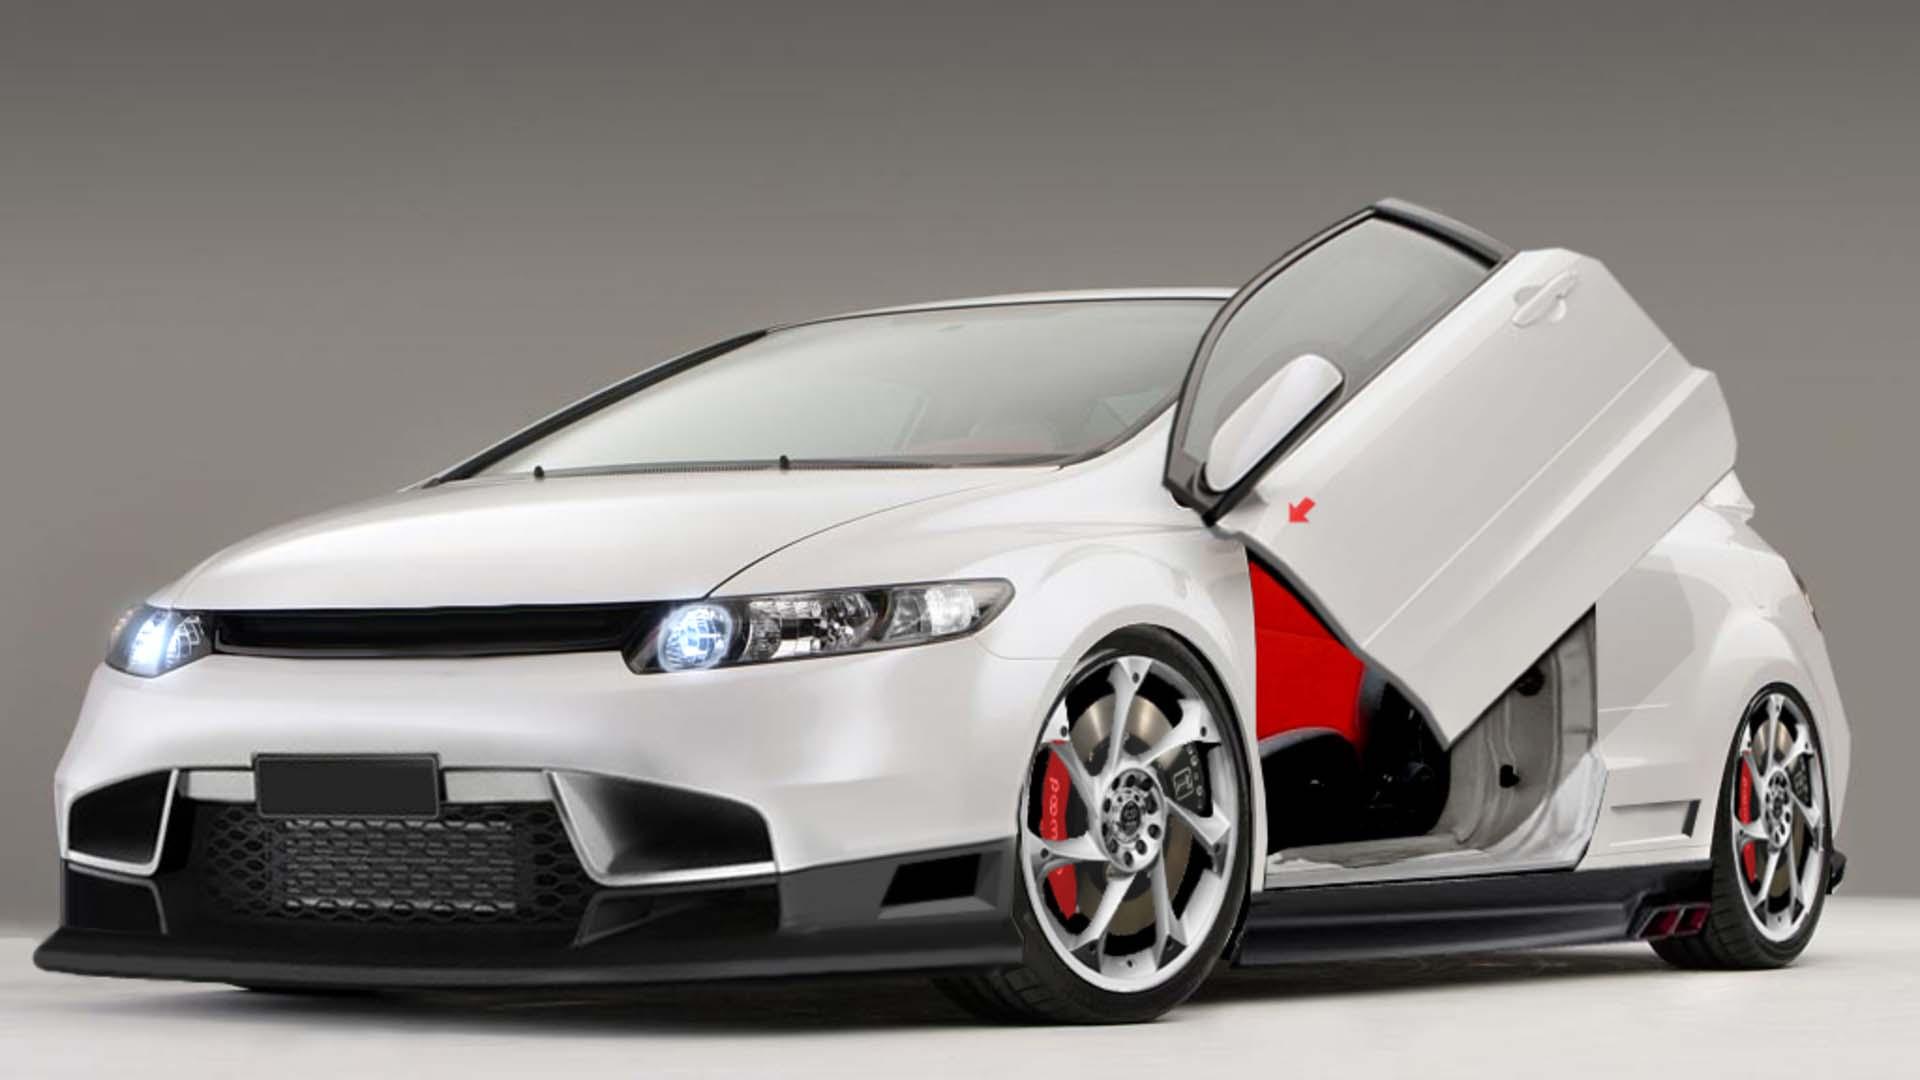 Honda Civic Si High Quality Wallpaper